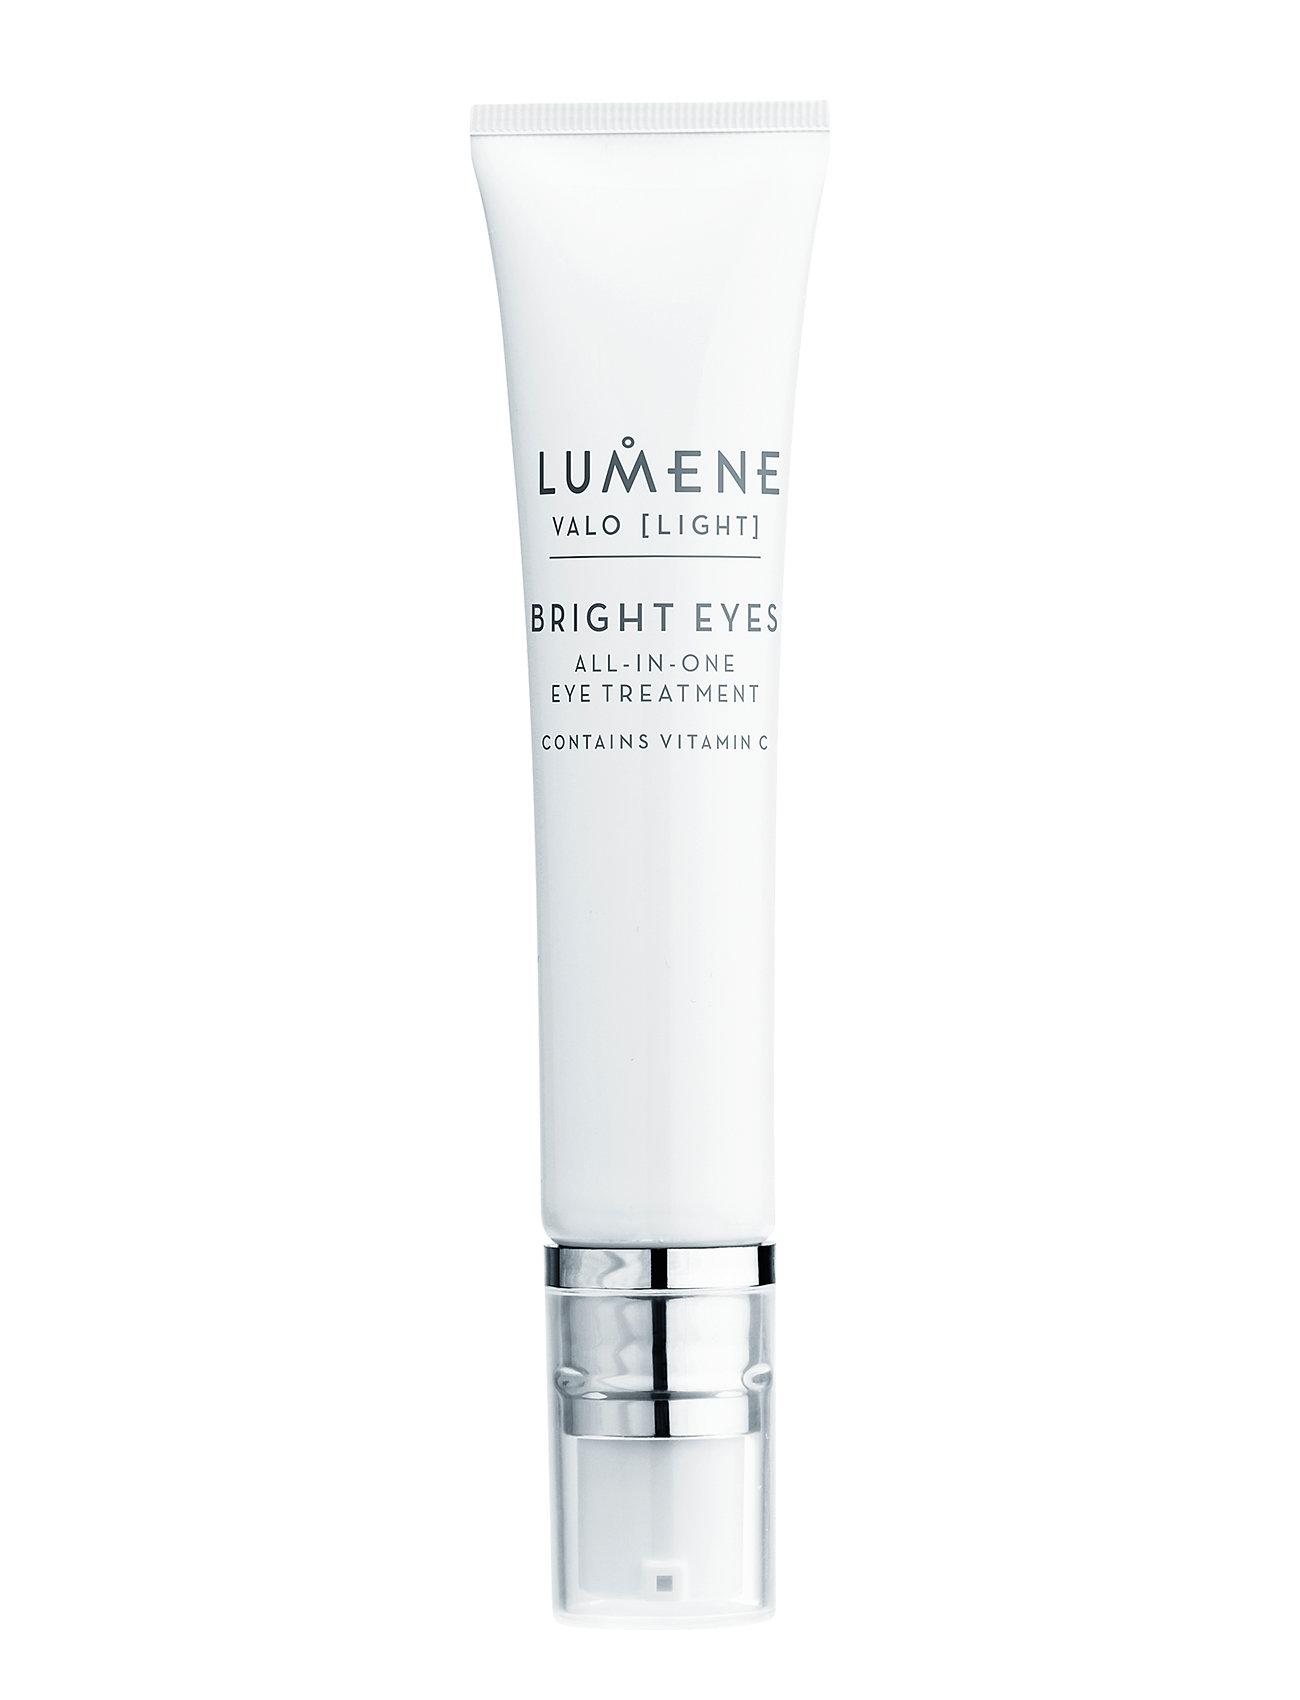 Image of Valo Nordic-C Bright Eyes All-In- Eye Treatment Beauty WOMEN Skin Care Face Eye Cream Nude LUMENE (3297685125)